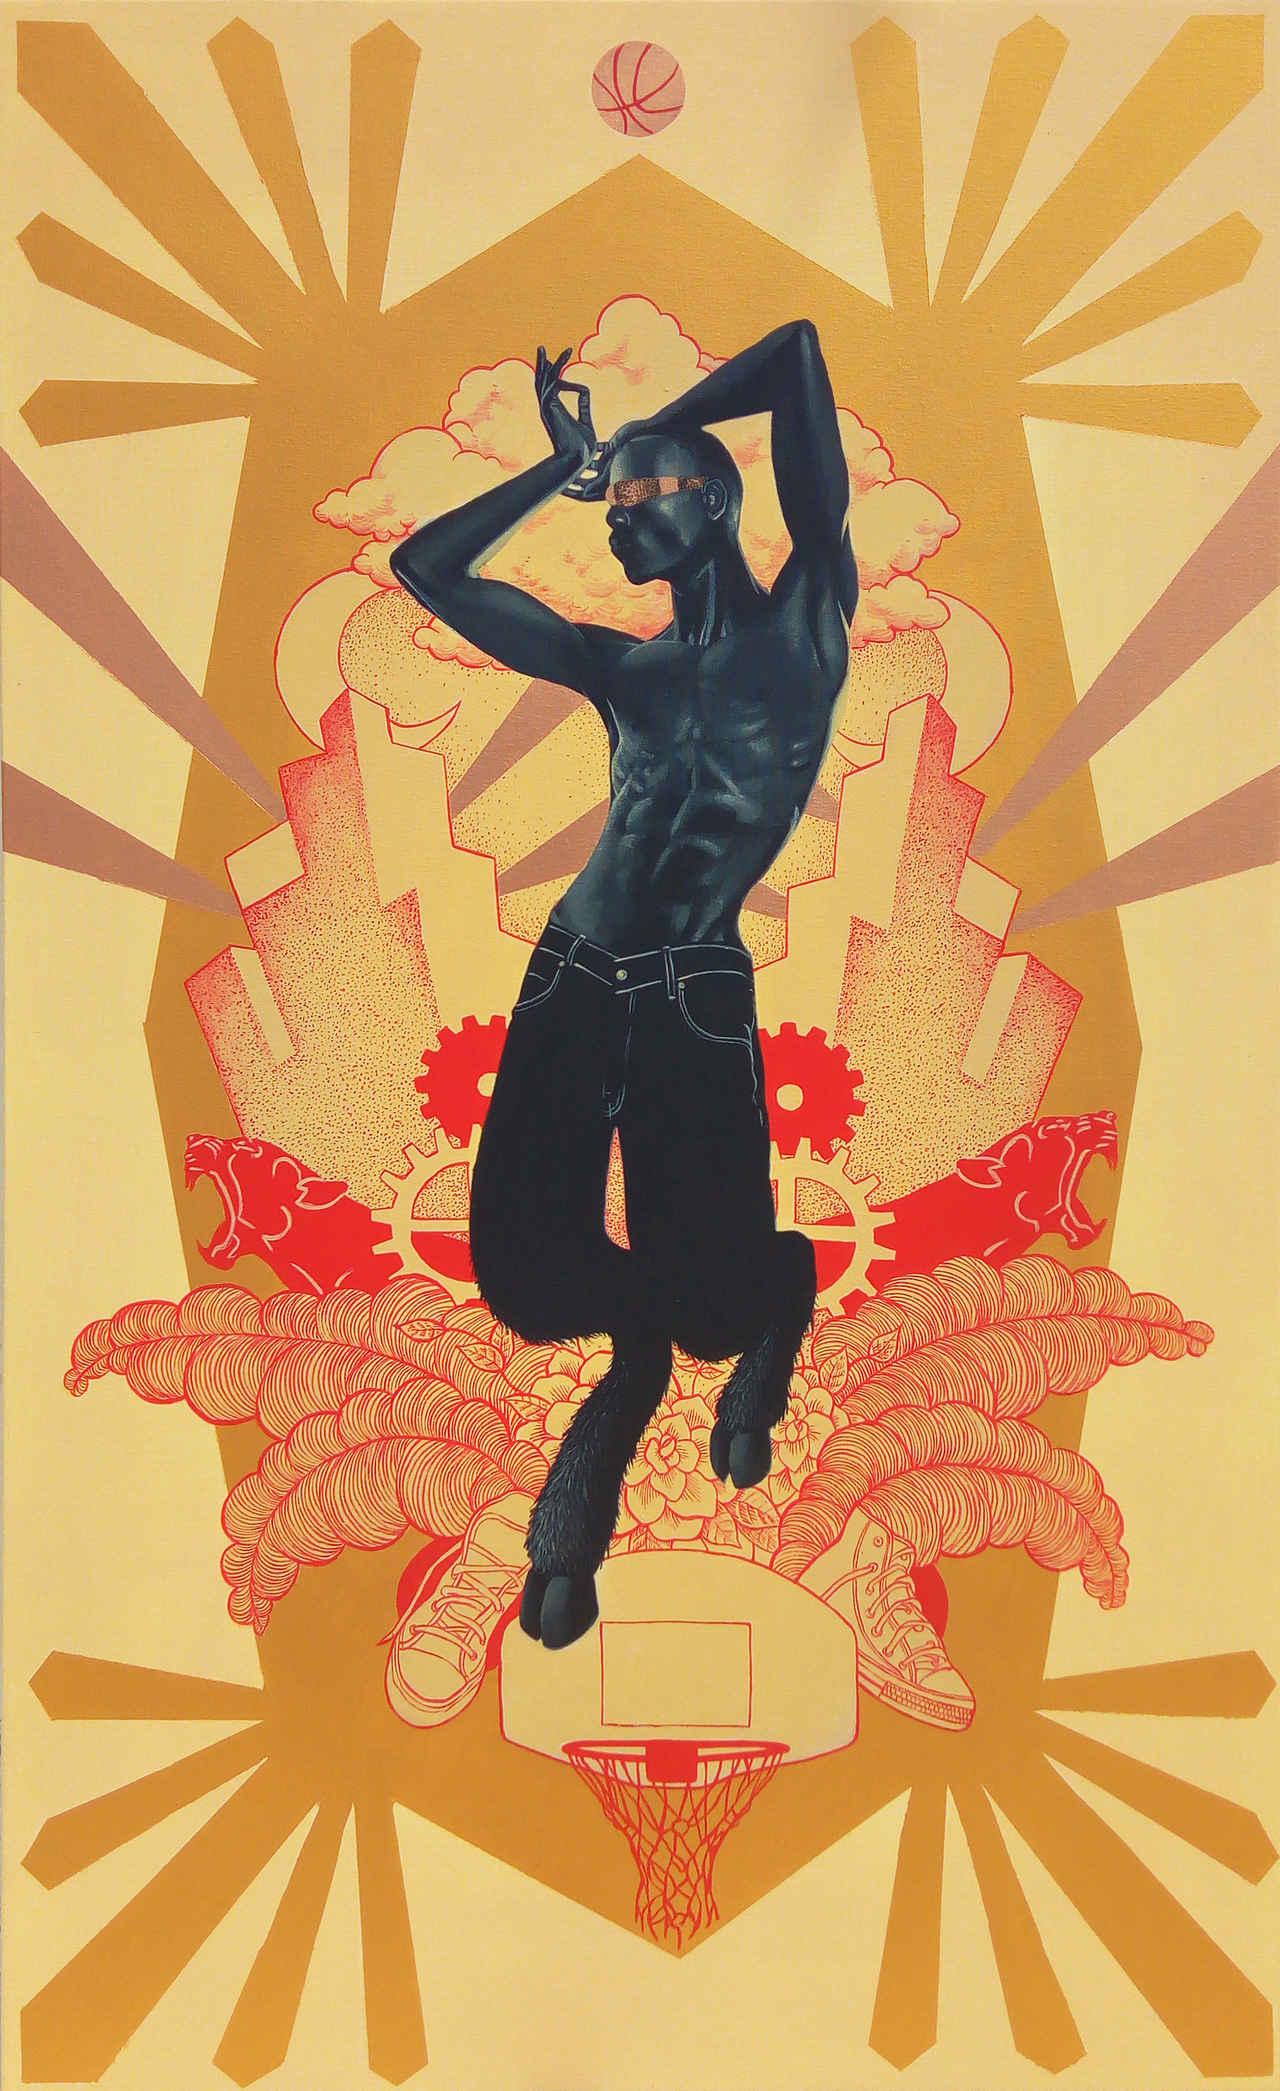 Stamatis Theoharis, Legendary, 80 x 130 cm, acrylic on canvas